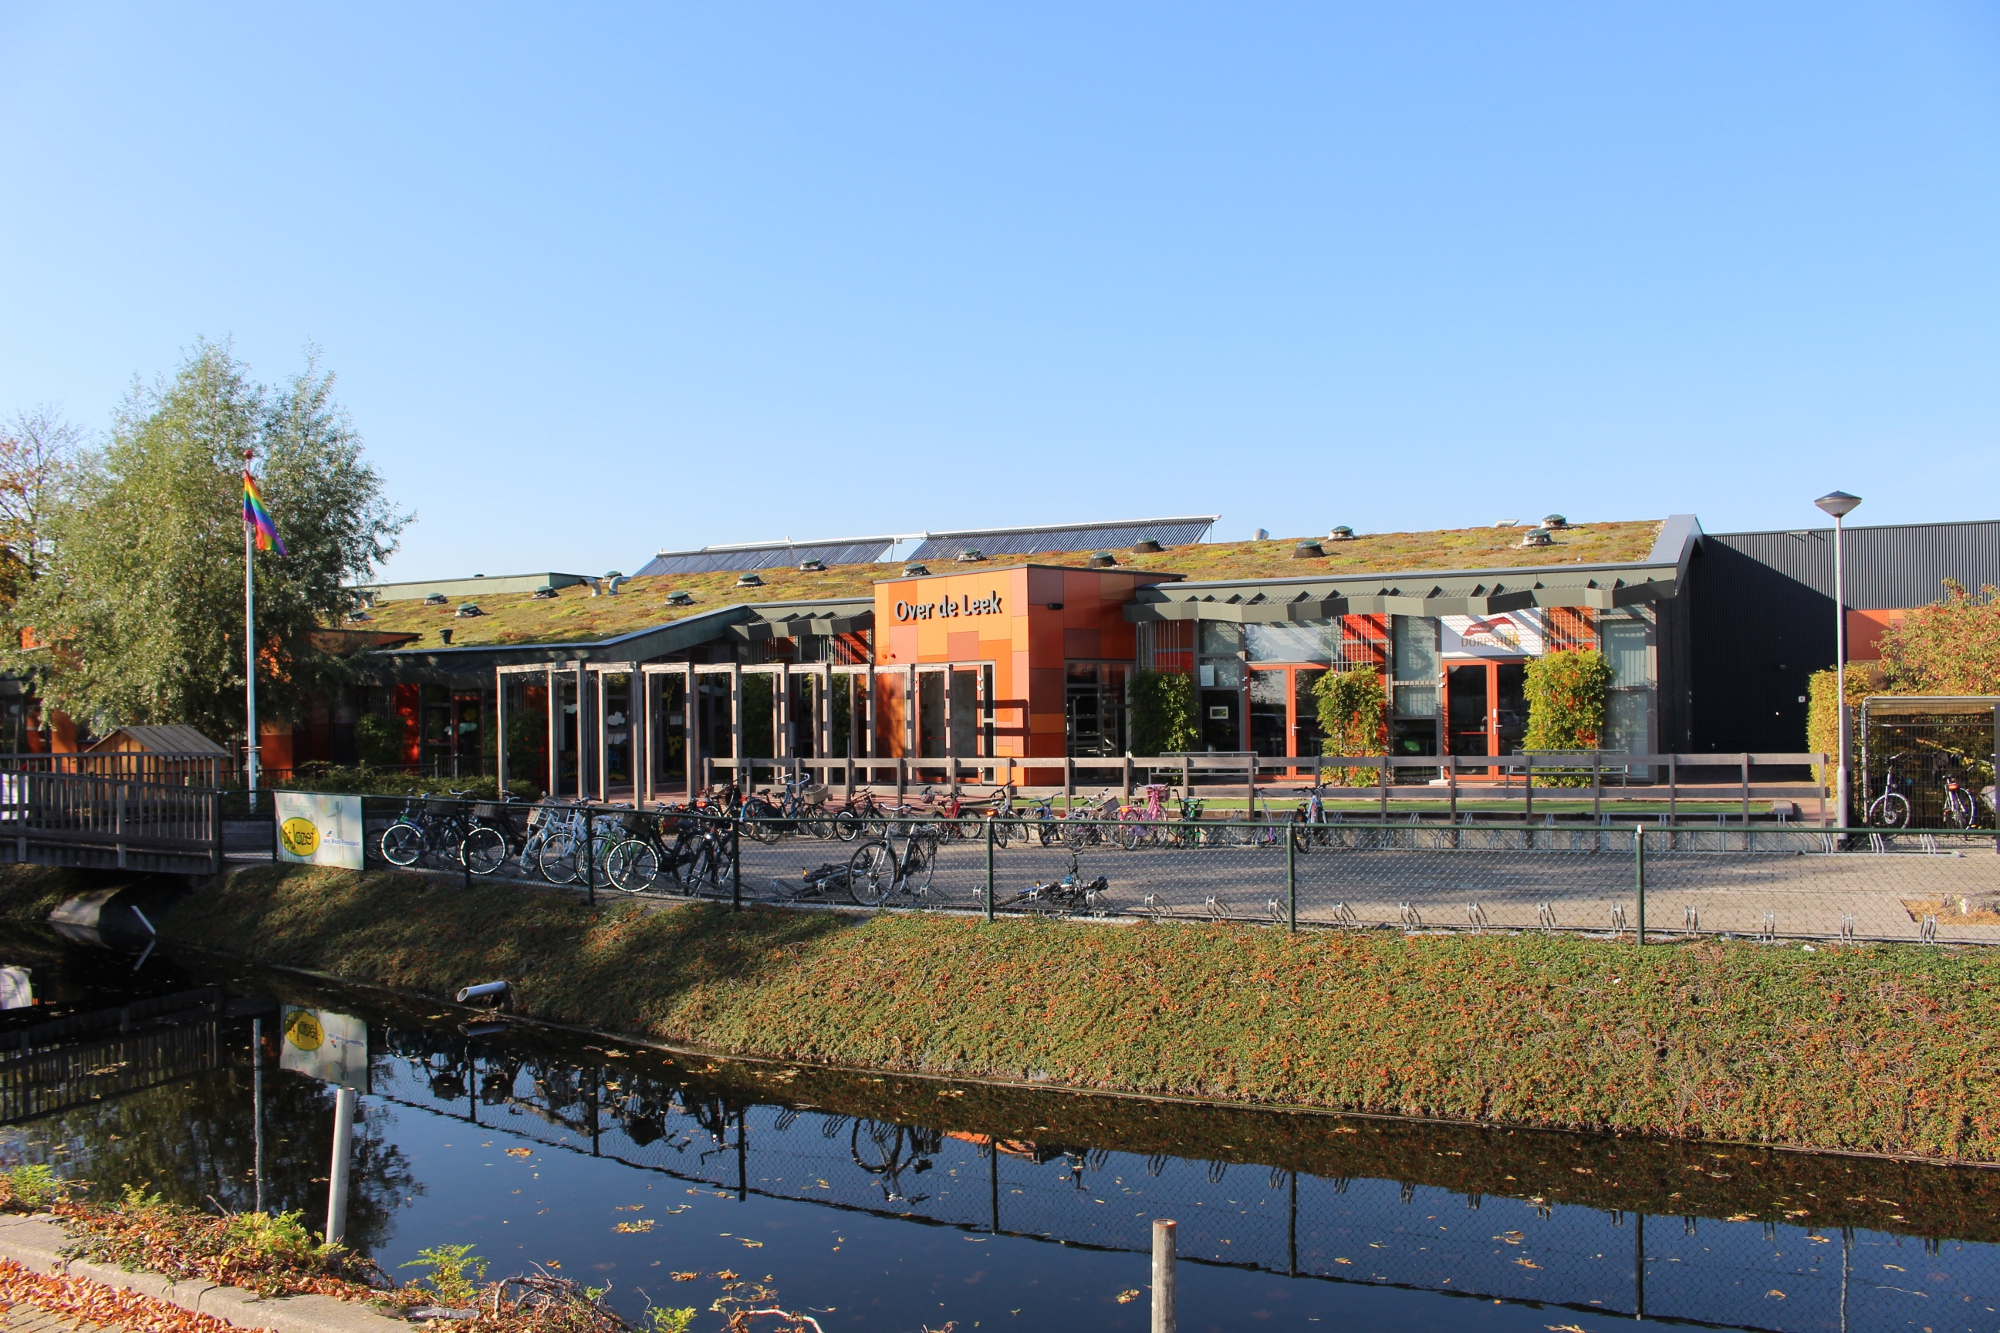 MFA Zwaagdijk-Oost